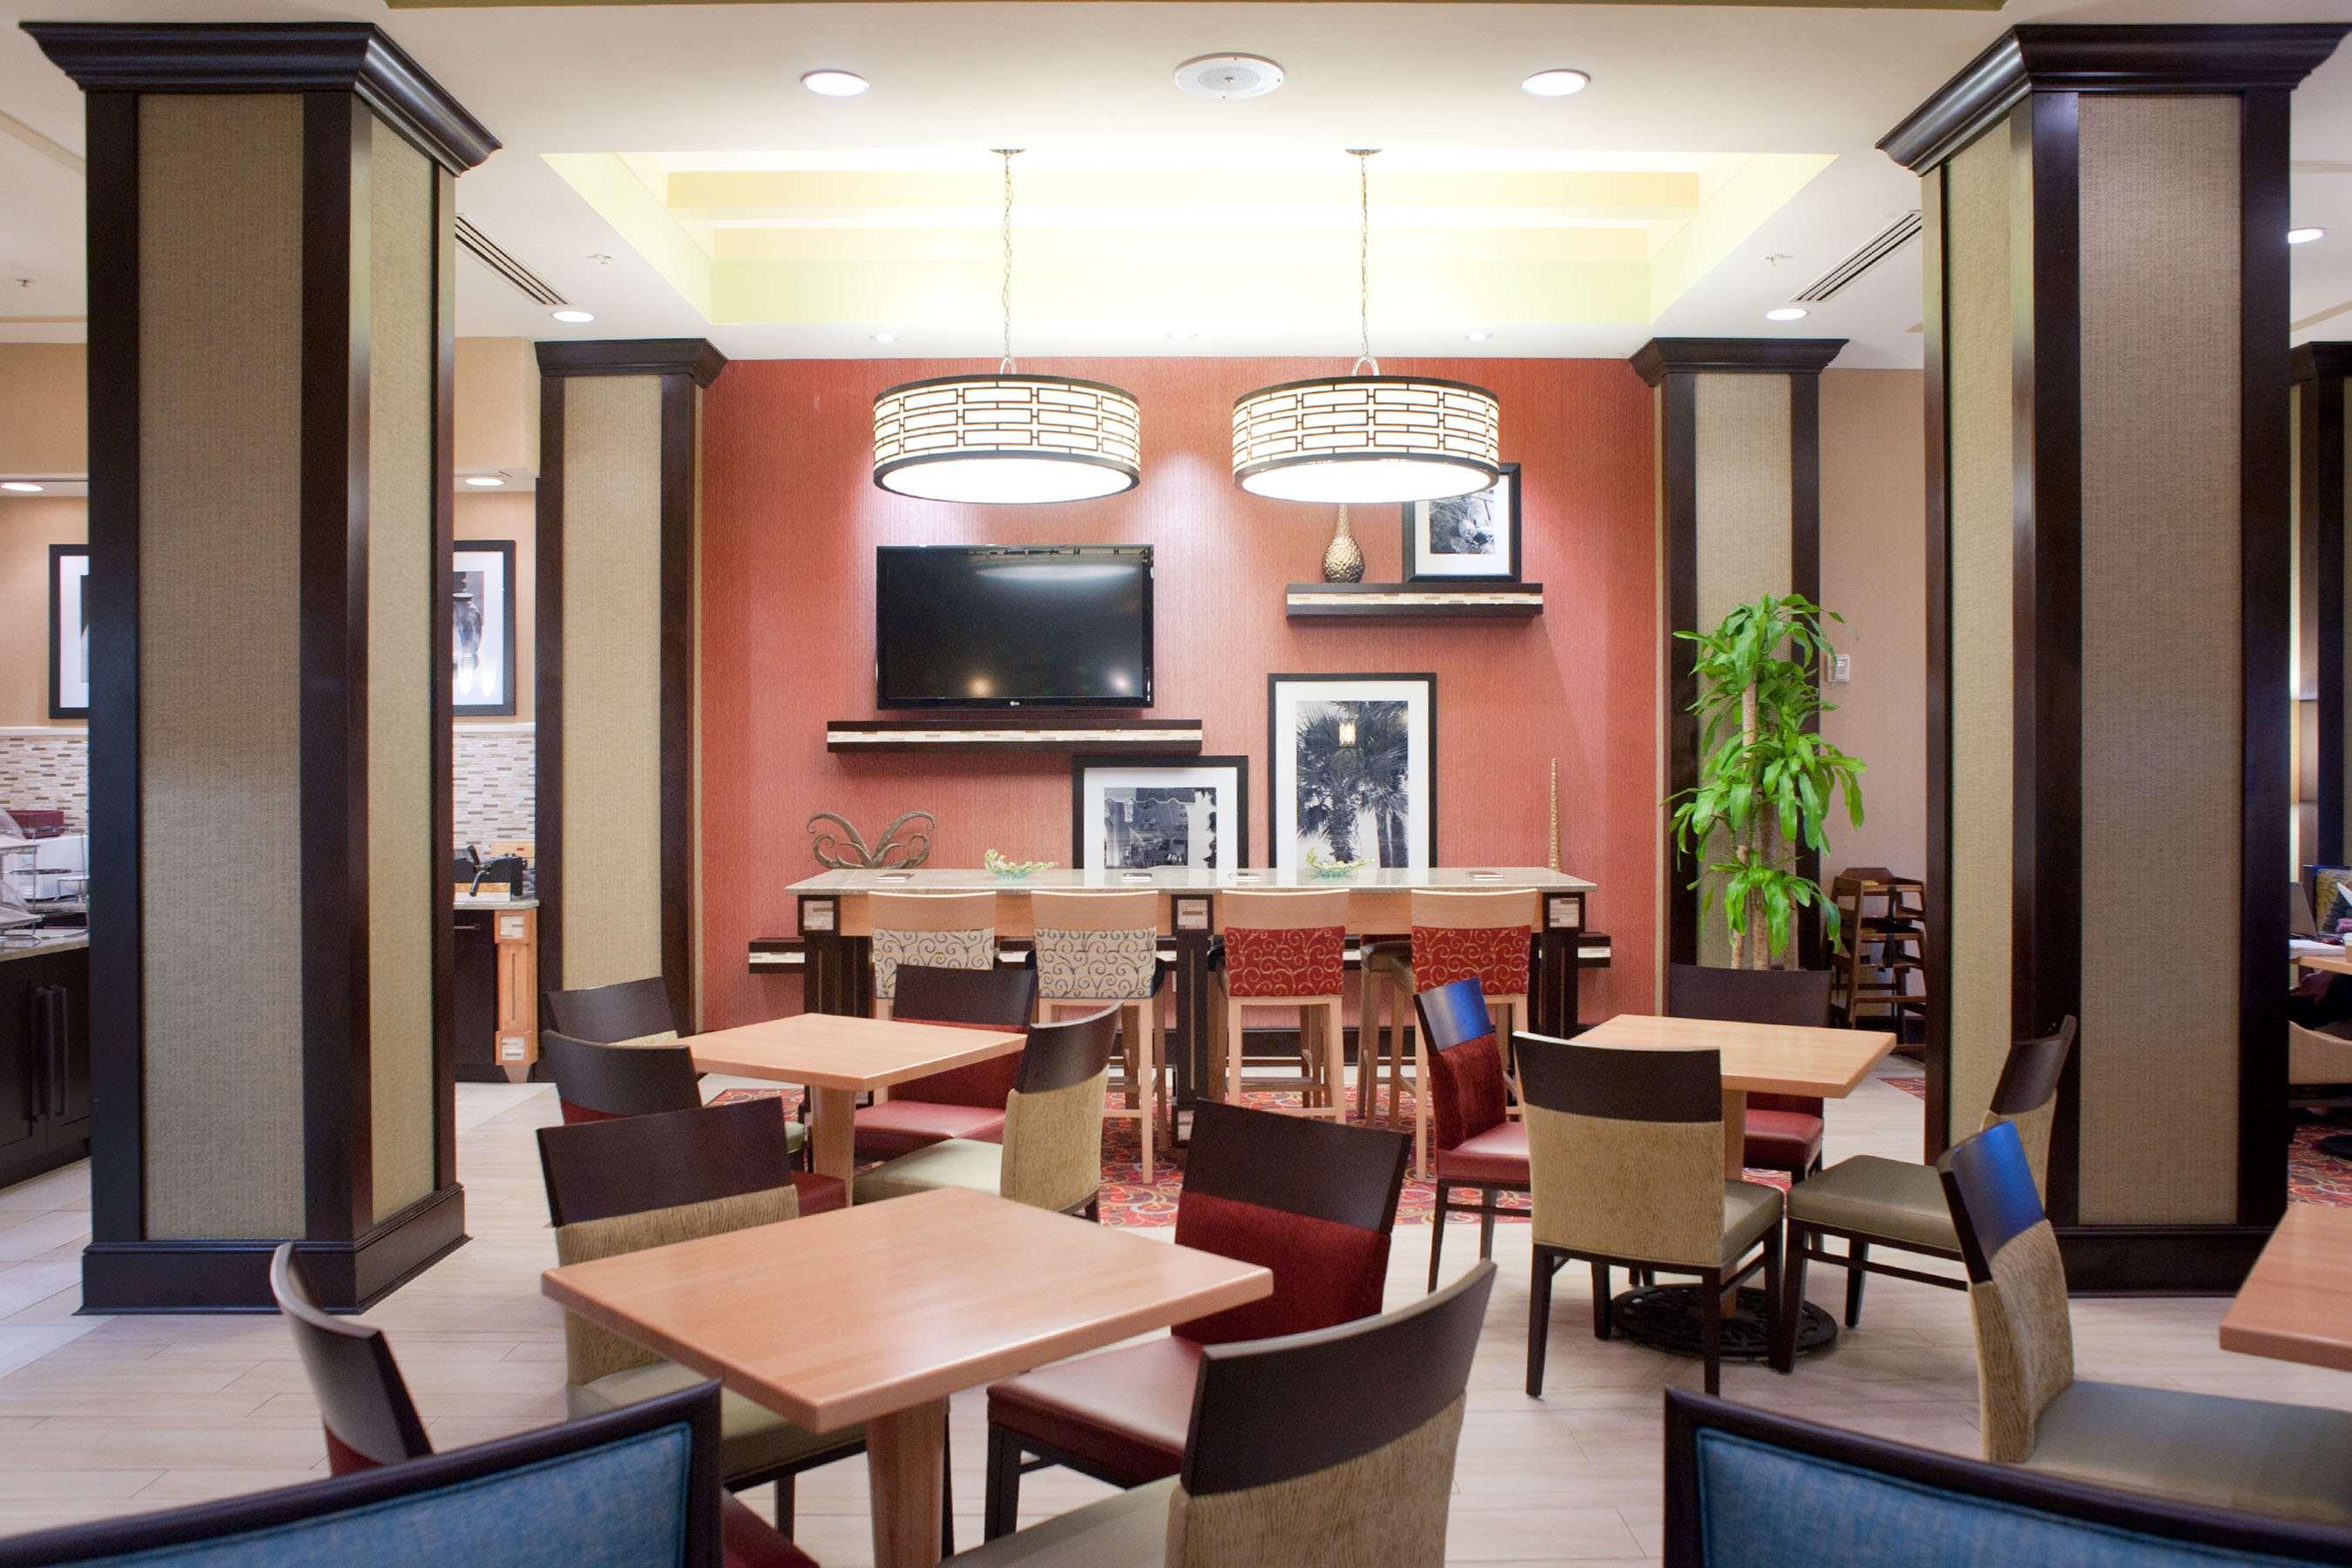 Hampton Inn & Suites St. Petersburg/Downtown image 1